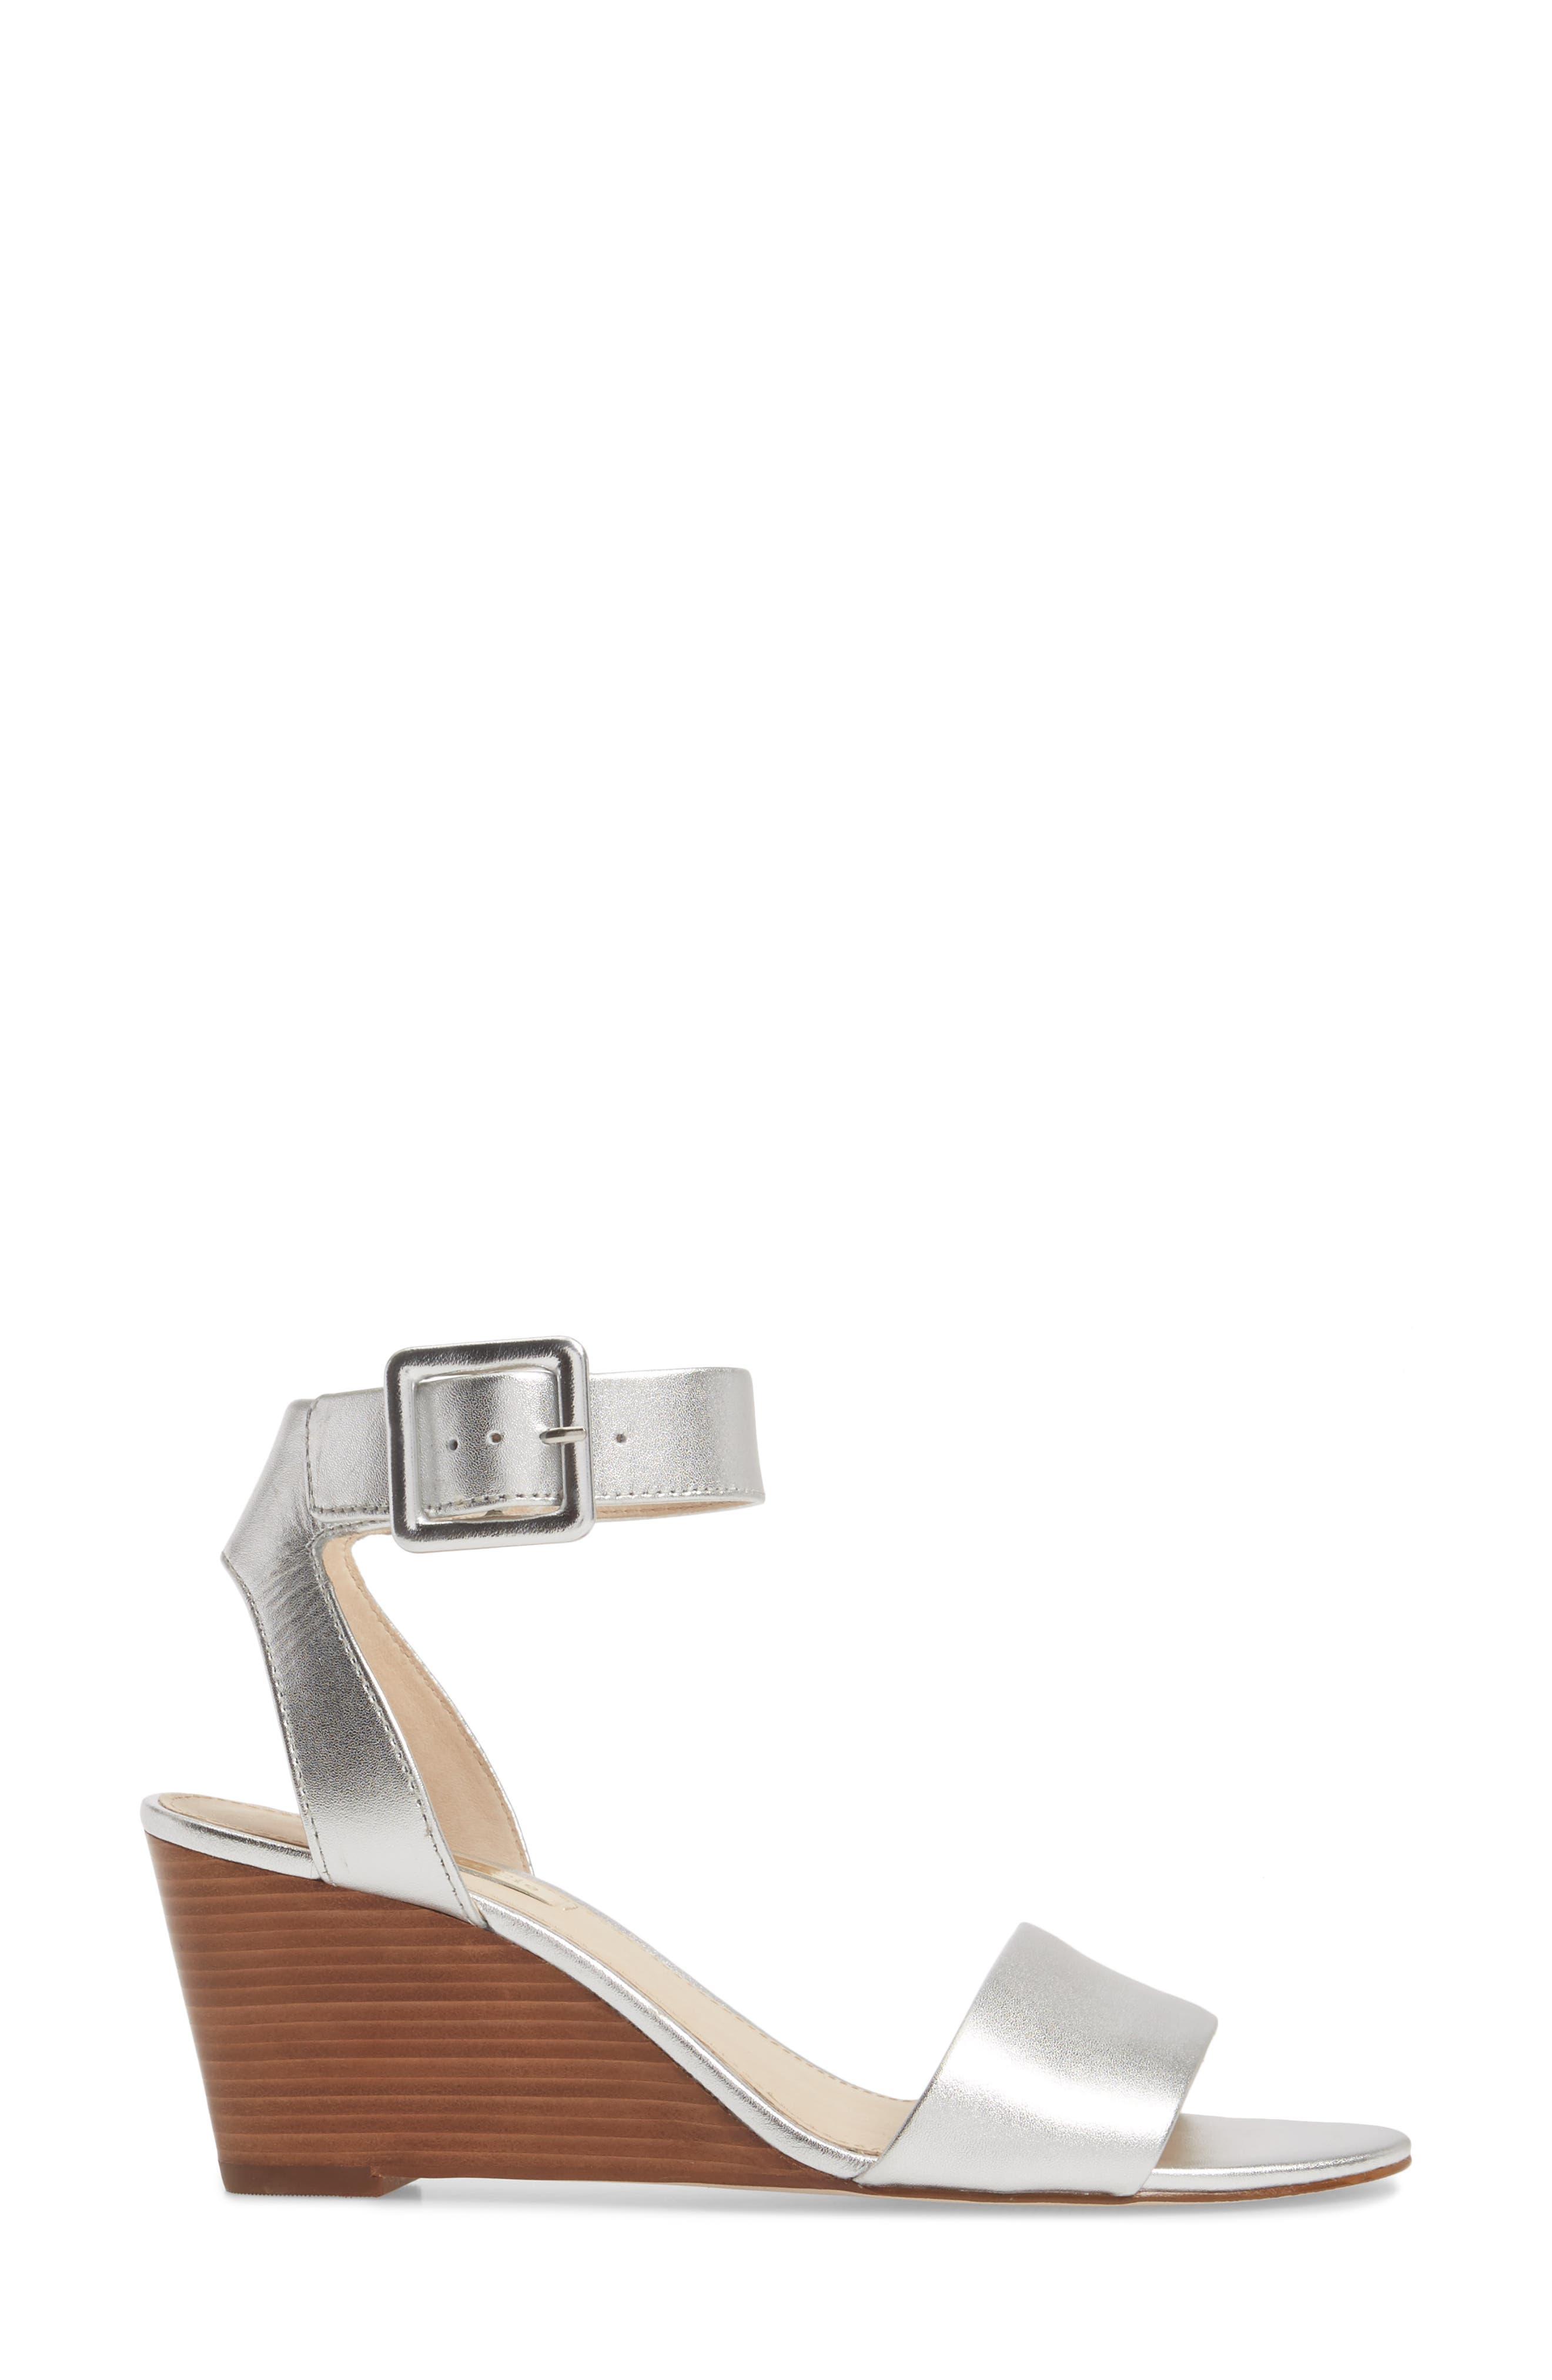 Punya Wedge Sandal,                             Alternate thumbnail 3, color,                             Metallic Silver Leather